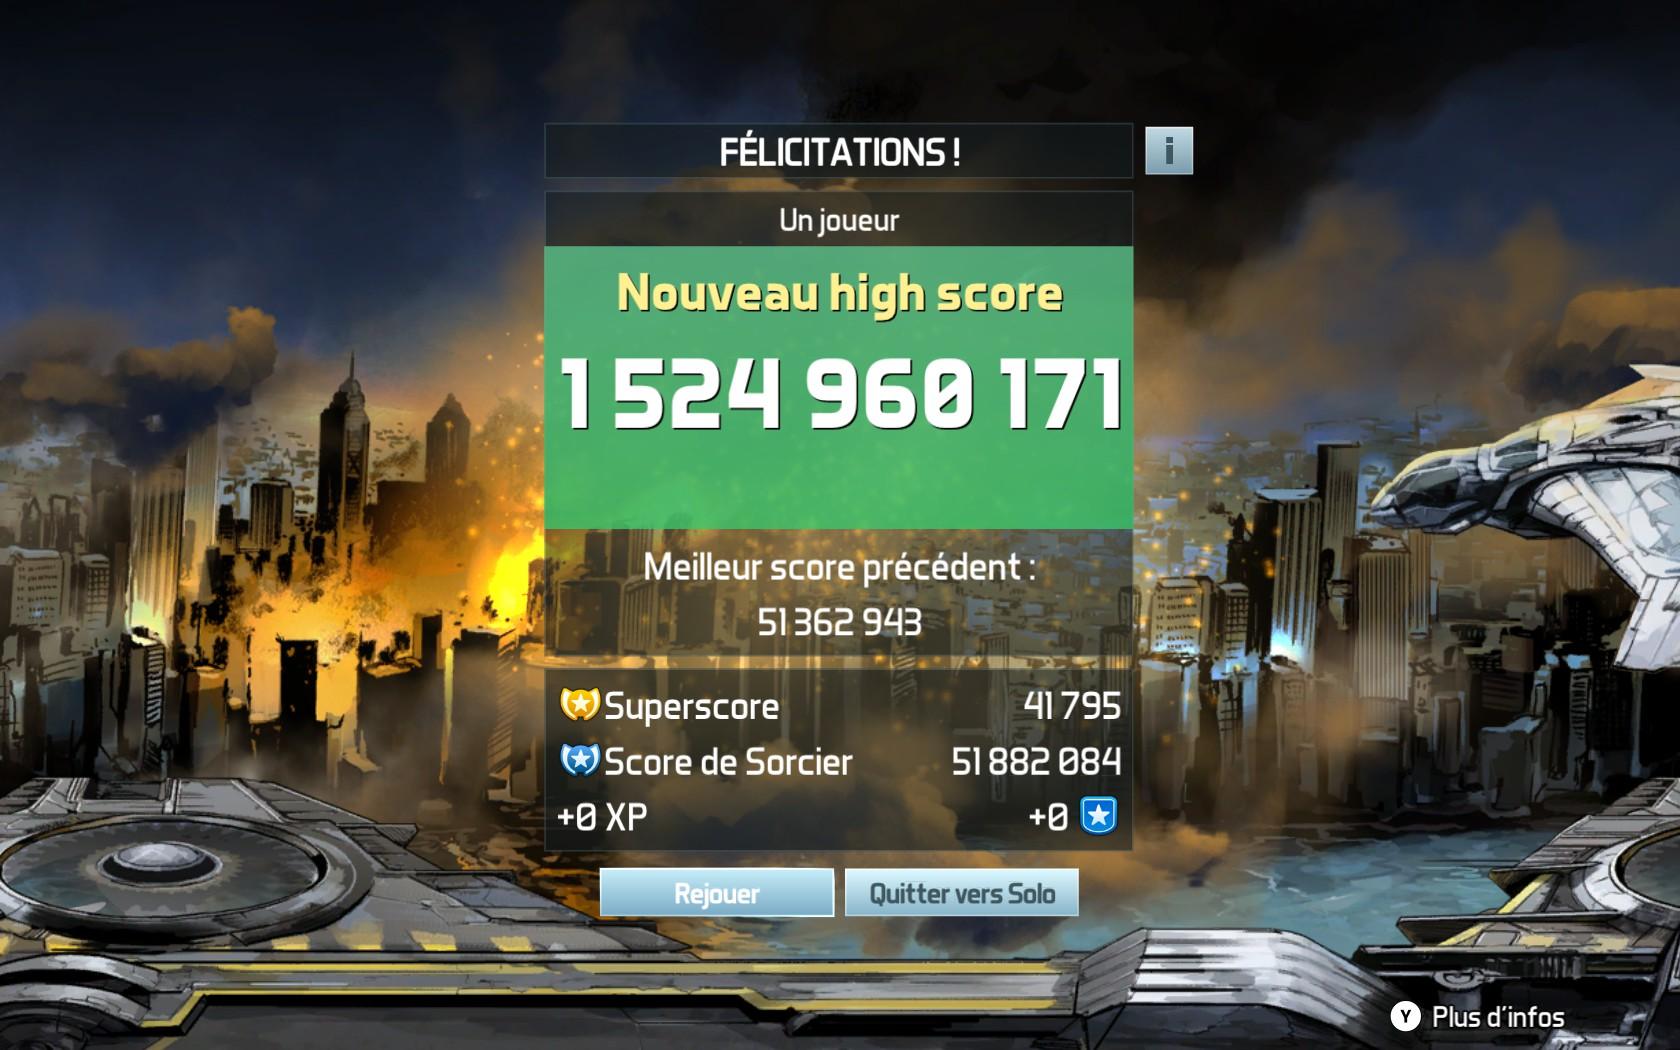 LUP's Club TdM 05.19 : Endgame • Age of Ultron, Ant-Man, The Avengers CCA08034D9EFDDD760A11C6E8E490006C1E6EF3B